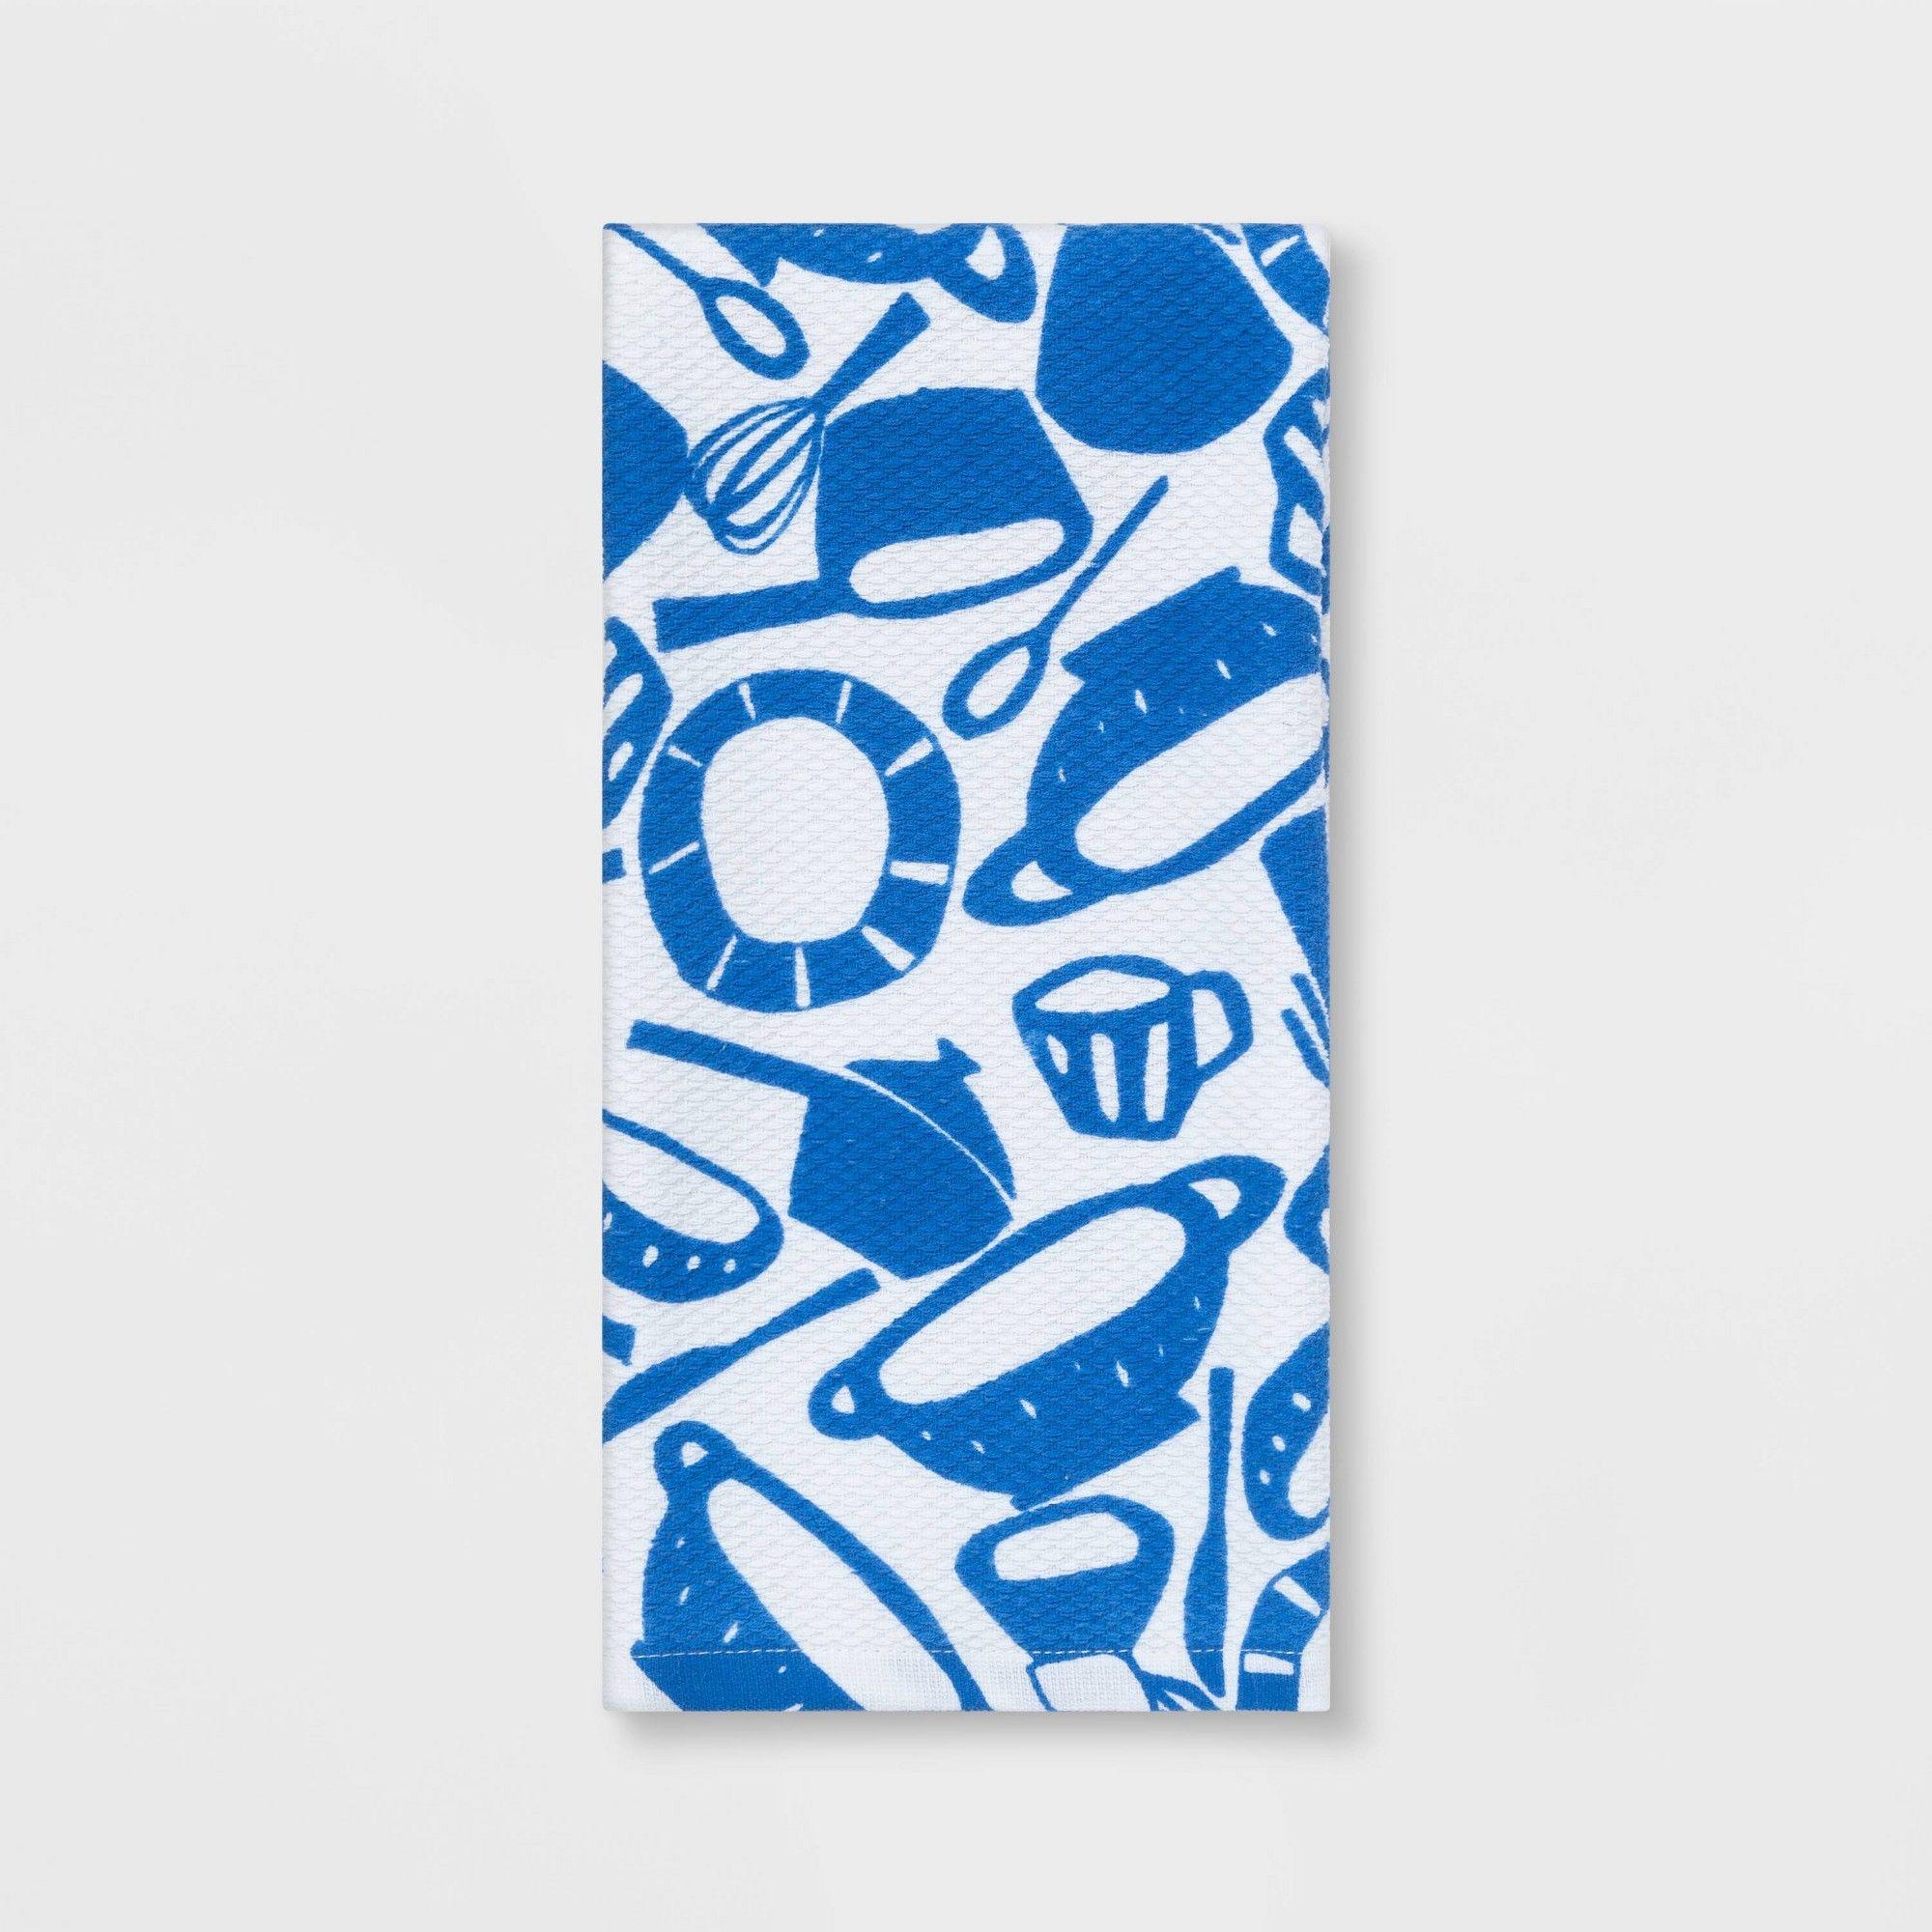 Kitchen Towel Blue White Room Essentials Blue Towels Black